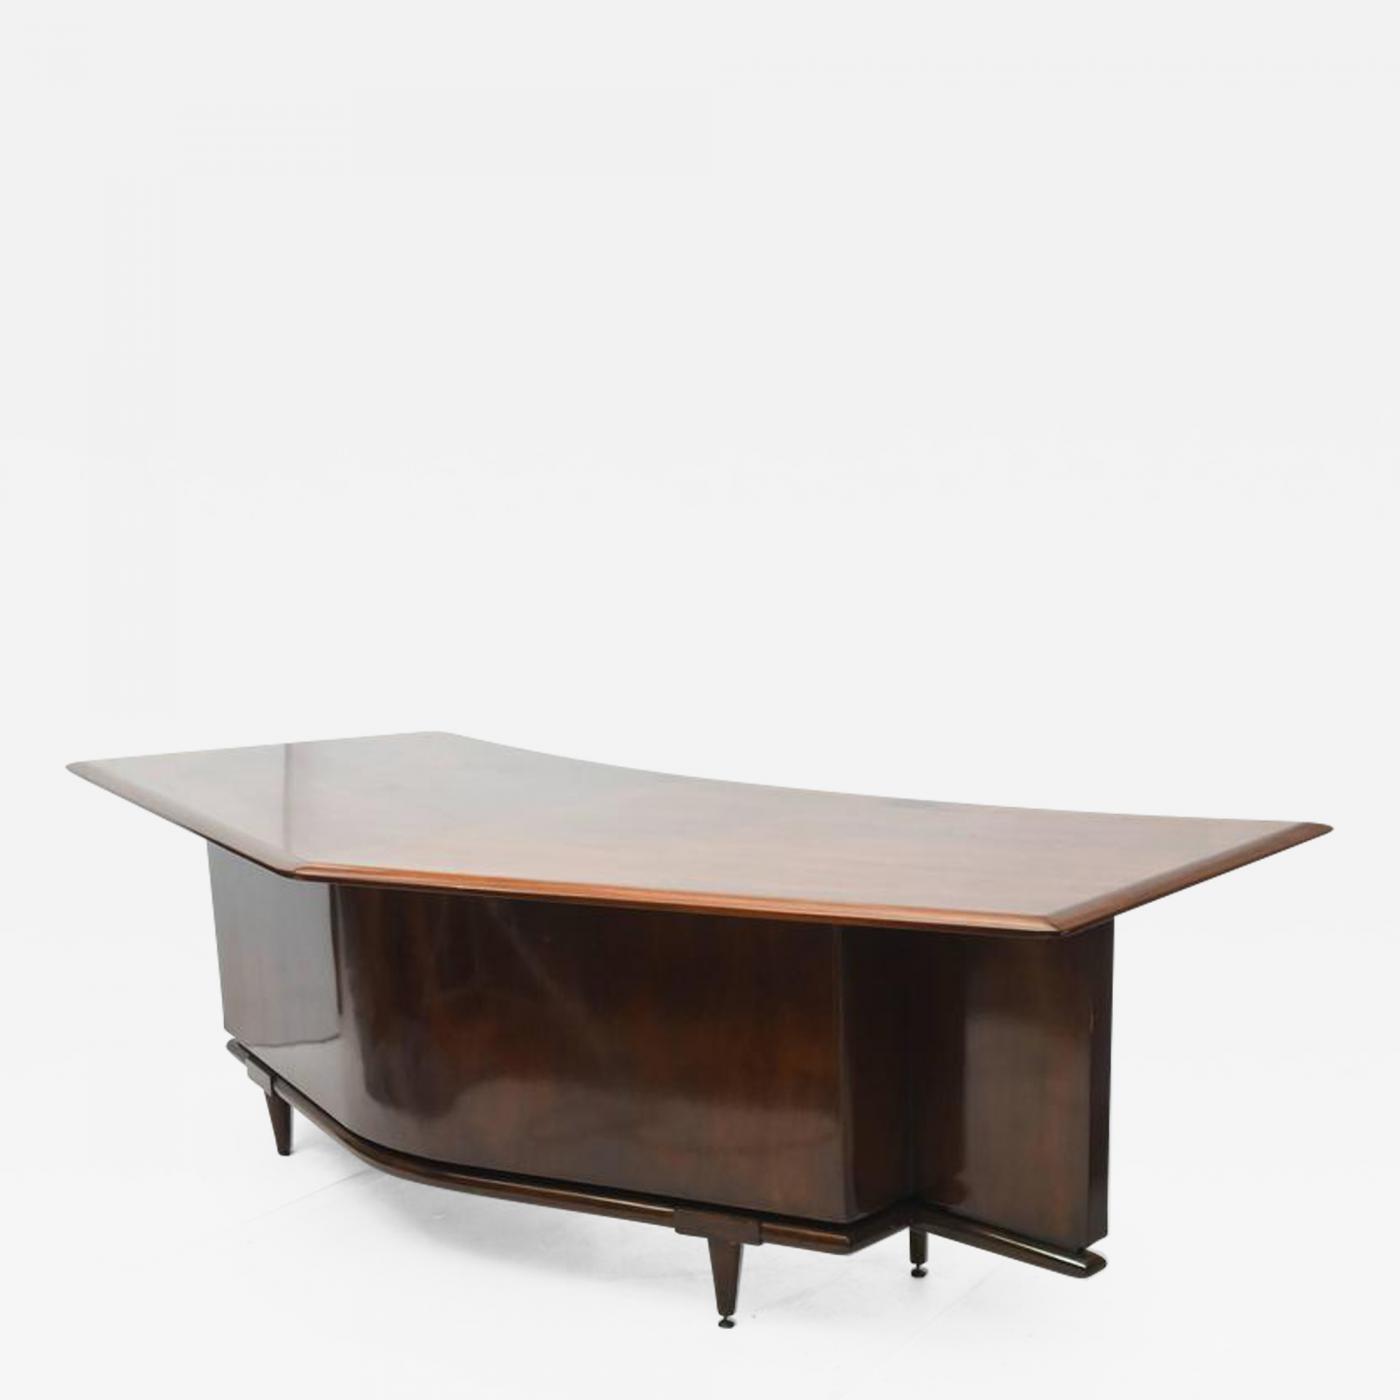 Image of: Monteverdi Young Fine American Modern Dark Walnut Executive Desk Custom Made By Monteverdi Young